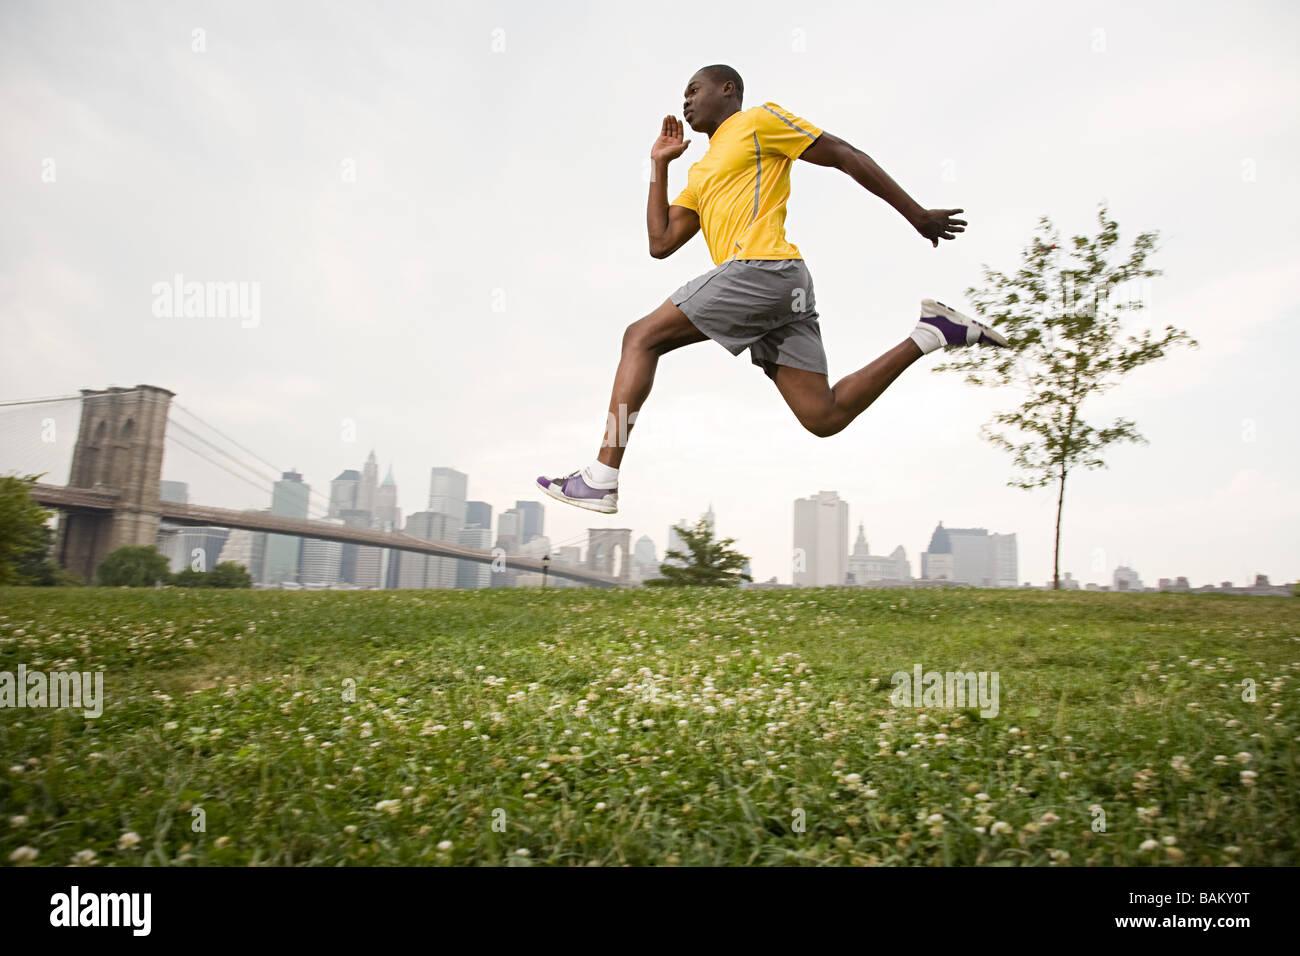 Athlete jumping - Stock Image